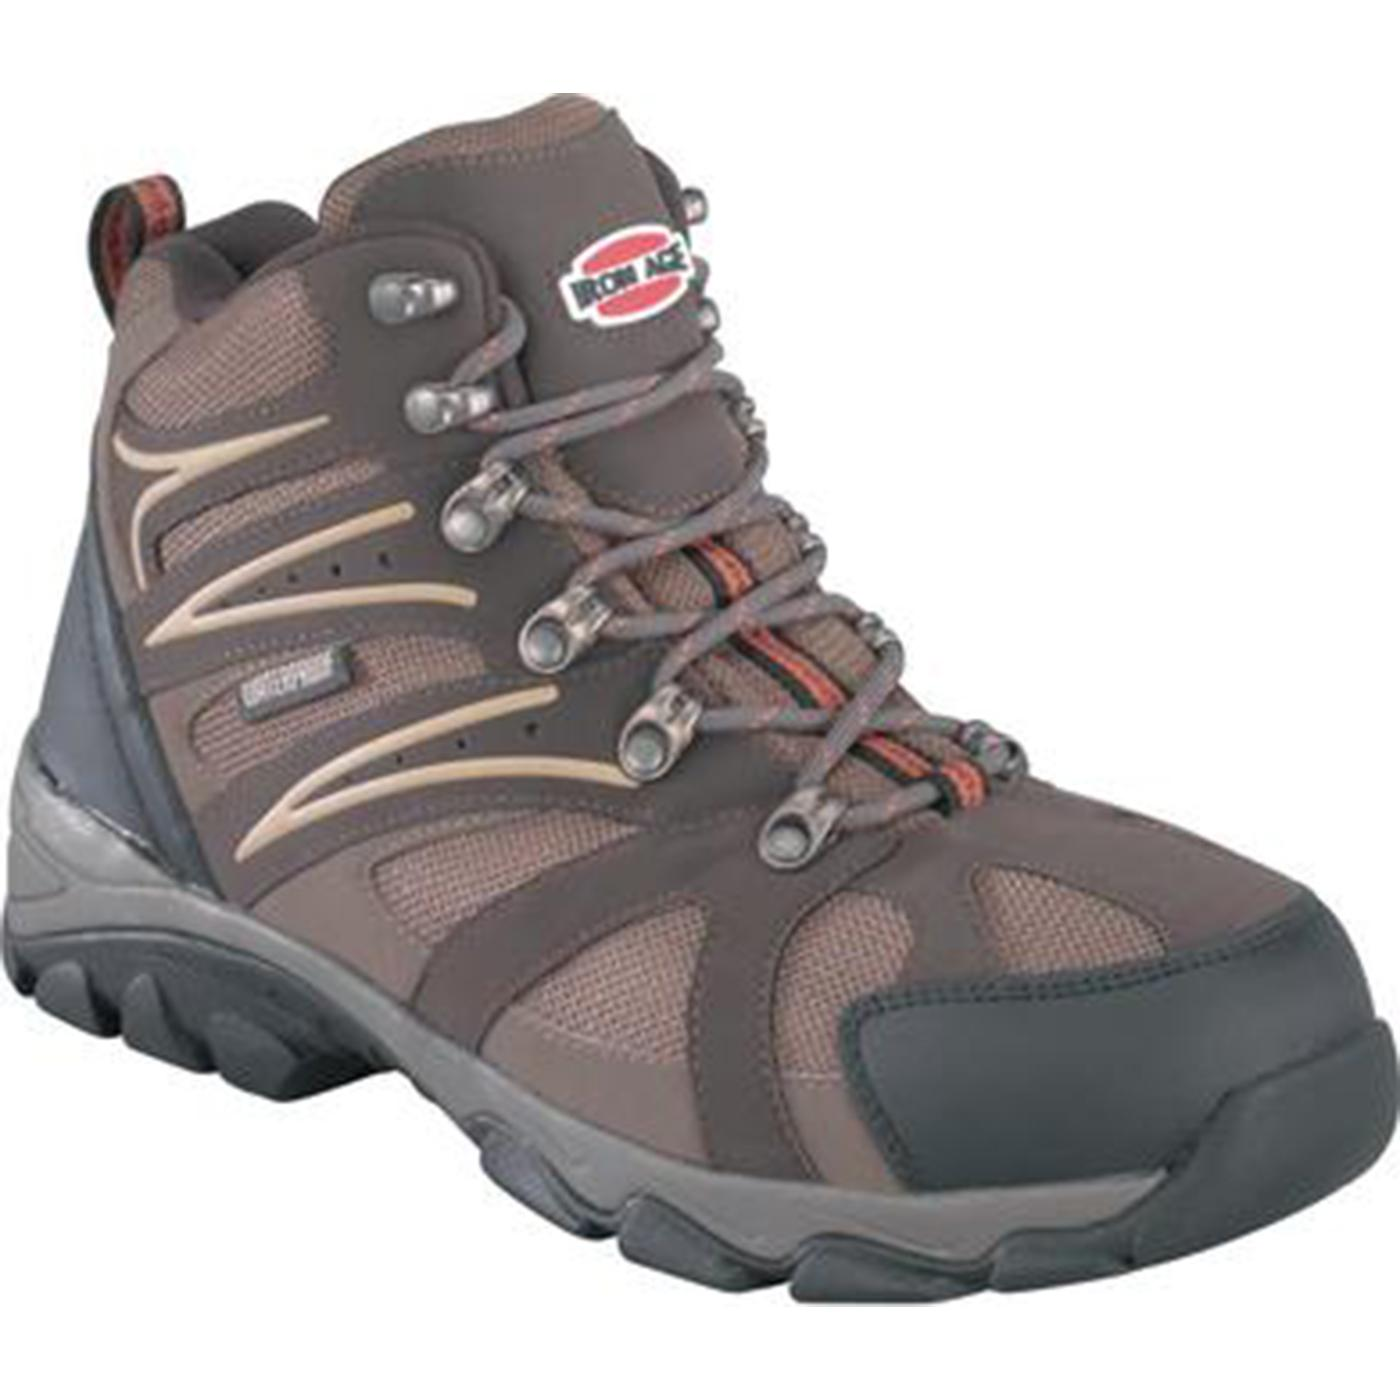 Iron Age Surveyor Men's ... Waterproof Steel-Toe Hiking Boots dvbVkW8Of